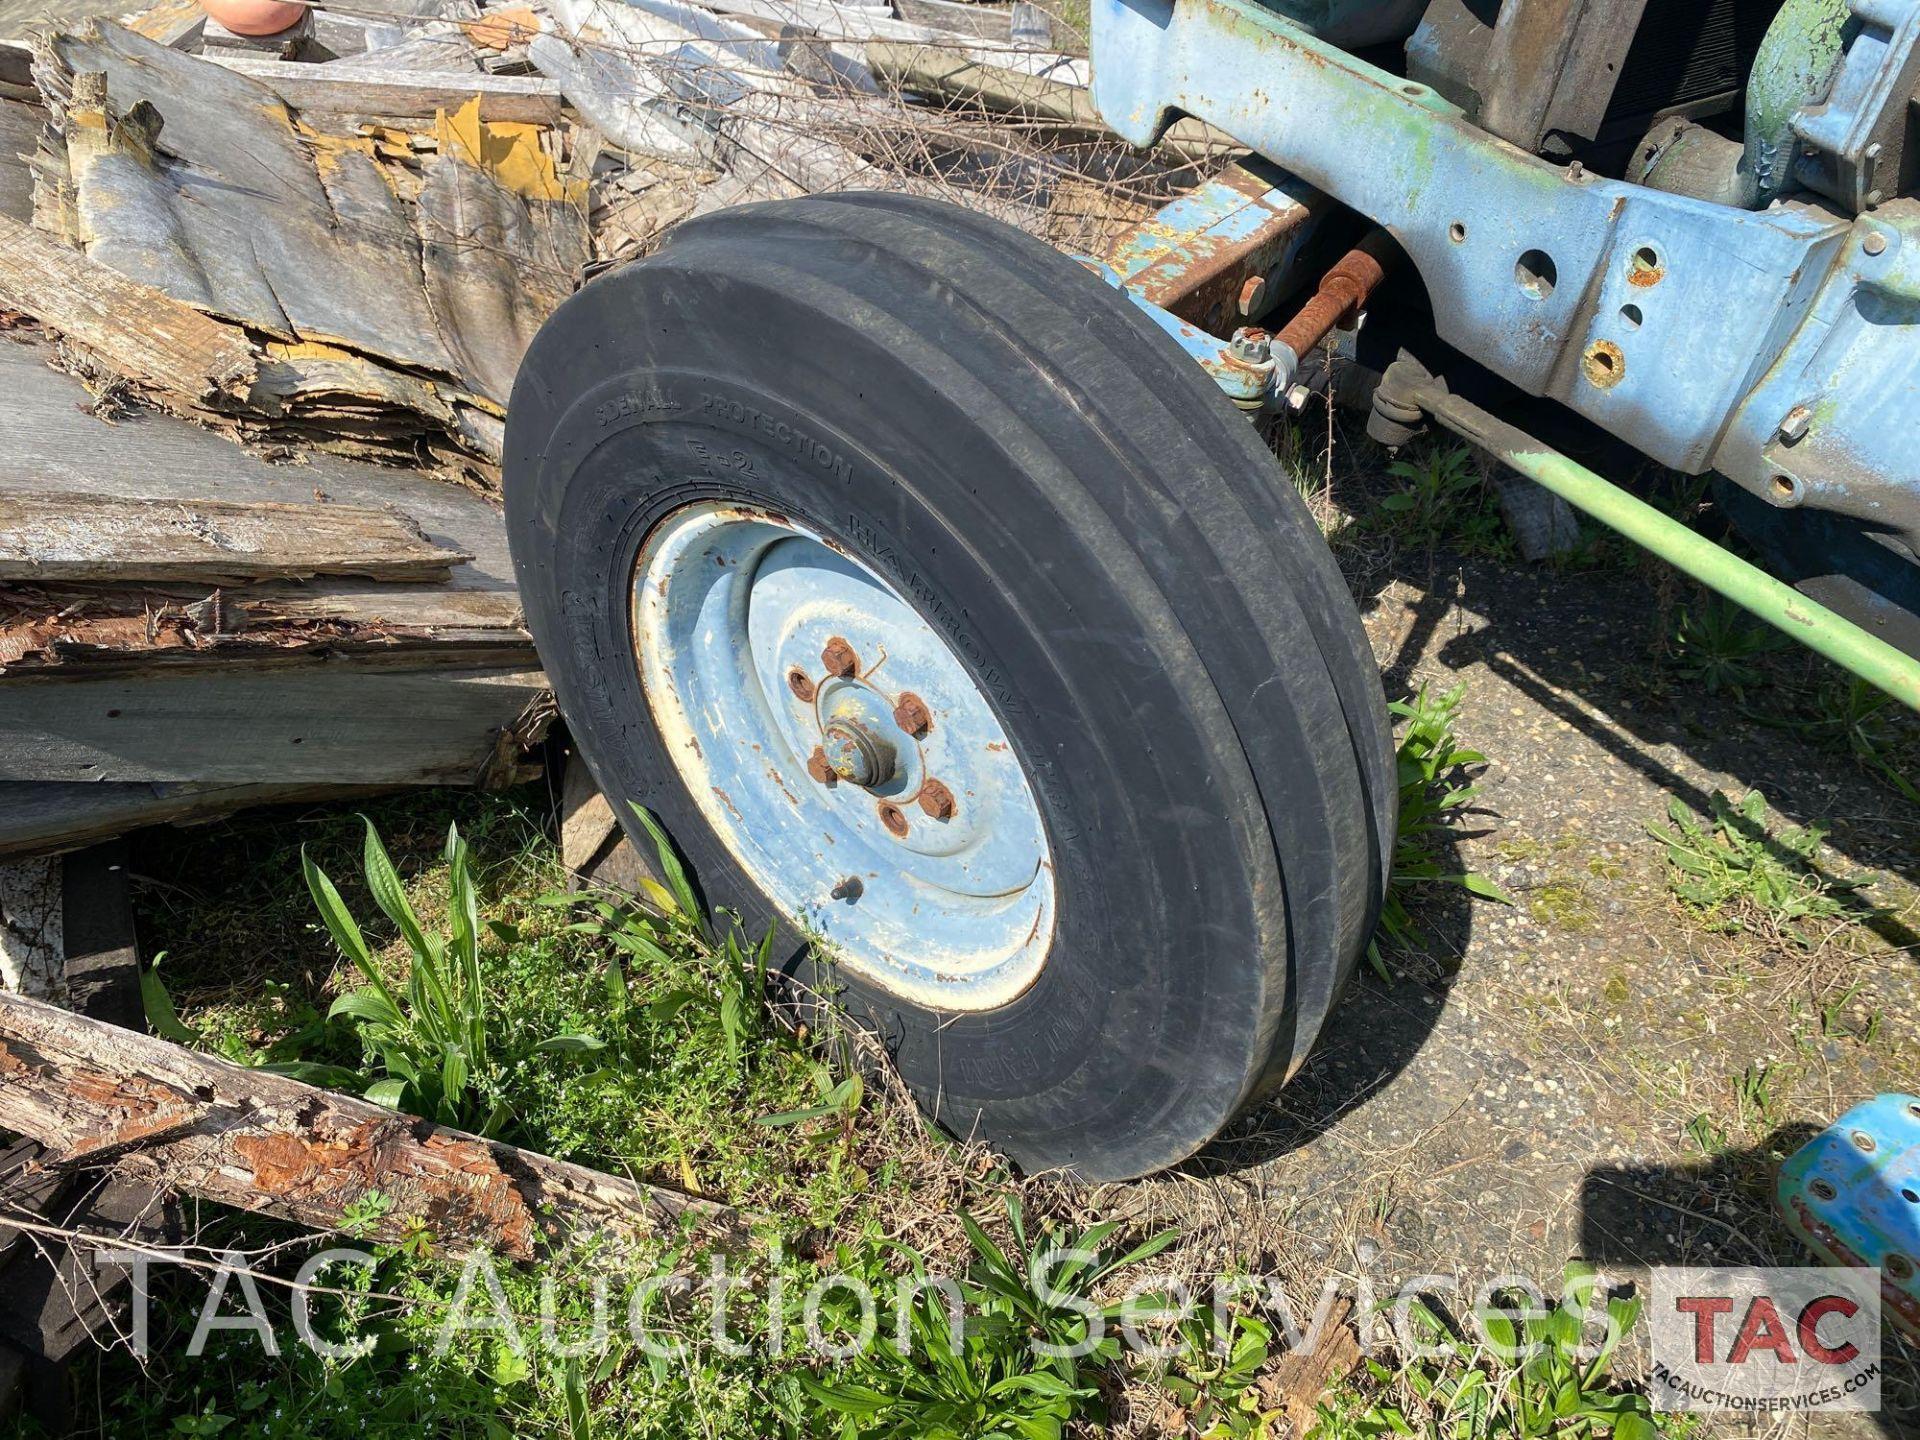 John Deere 2150 Farm Tractor - Image 32 of 34